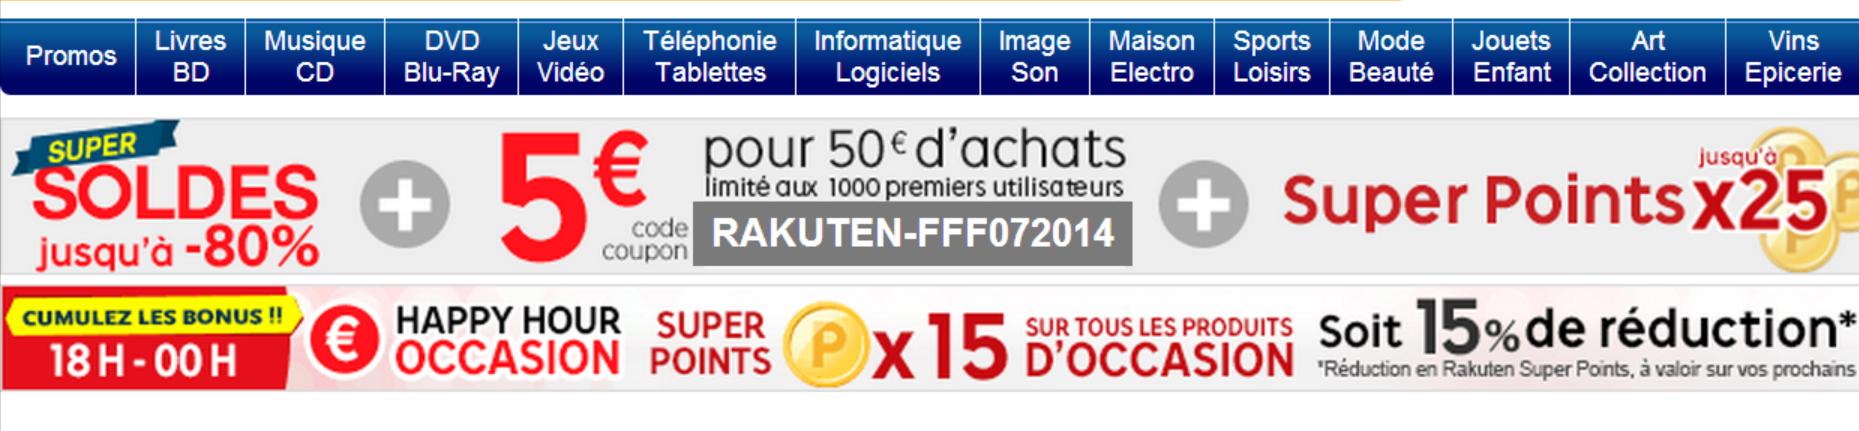 5€ offerts sur Priceminister pour 50€ d'achat